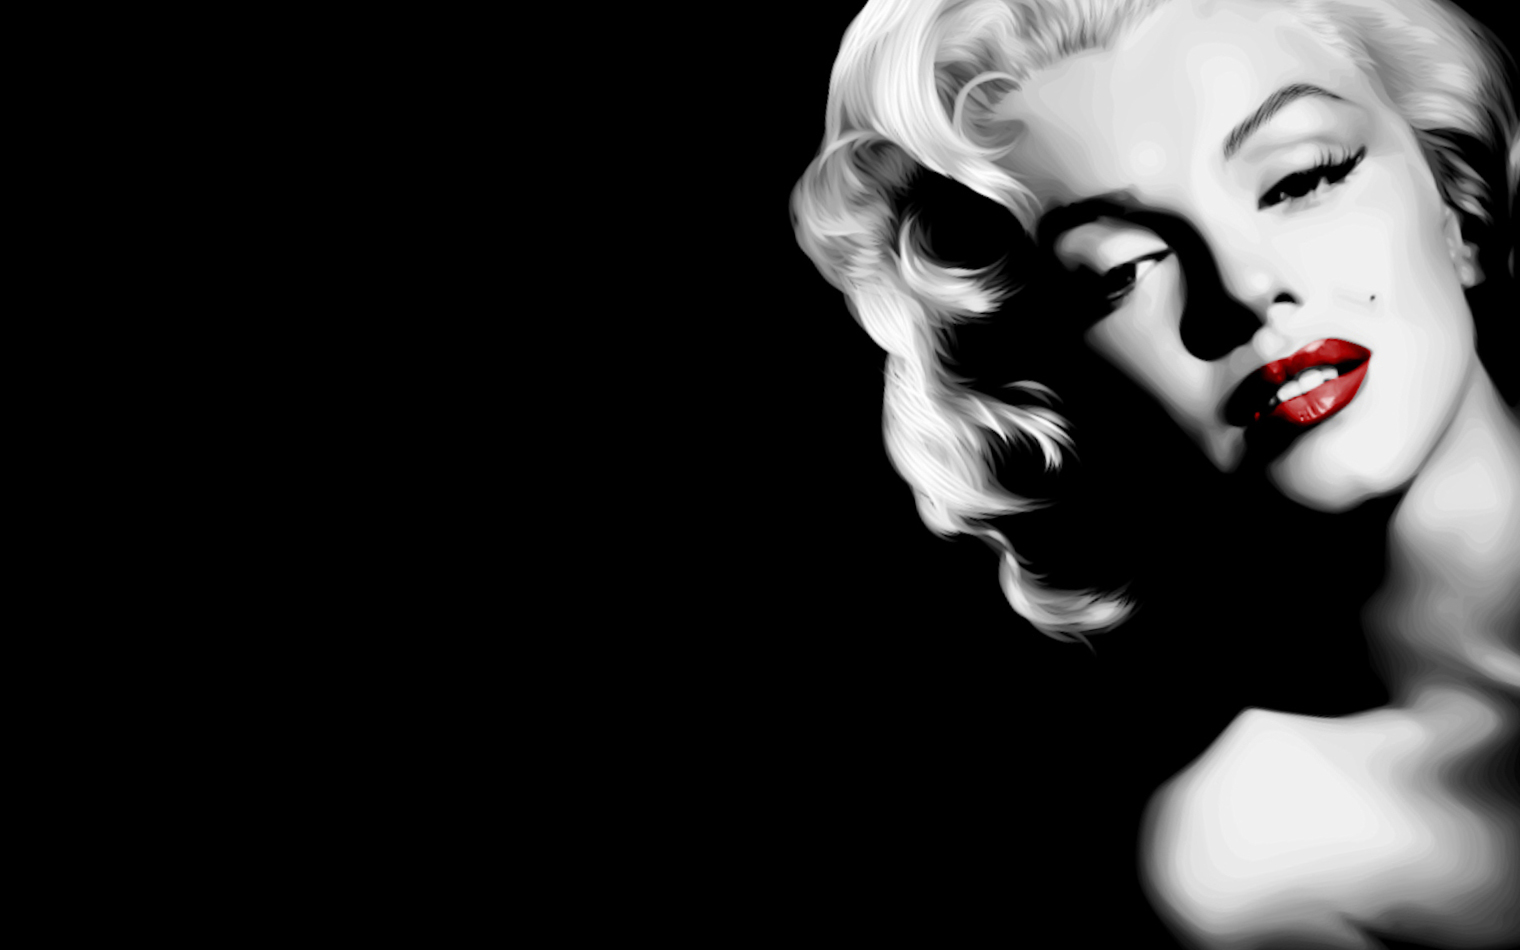 Mafia Girls Wallpaper Marilyn Monroe Pictures Images